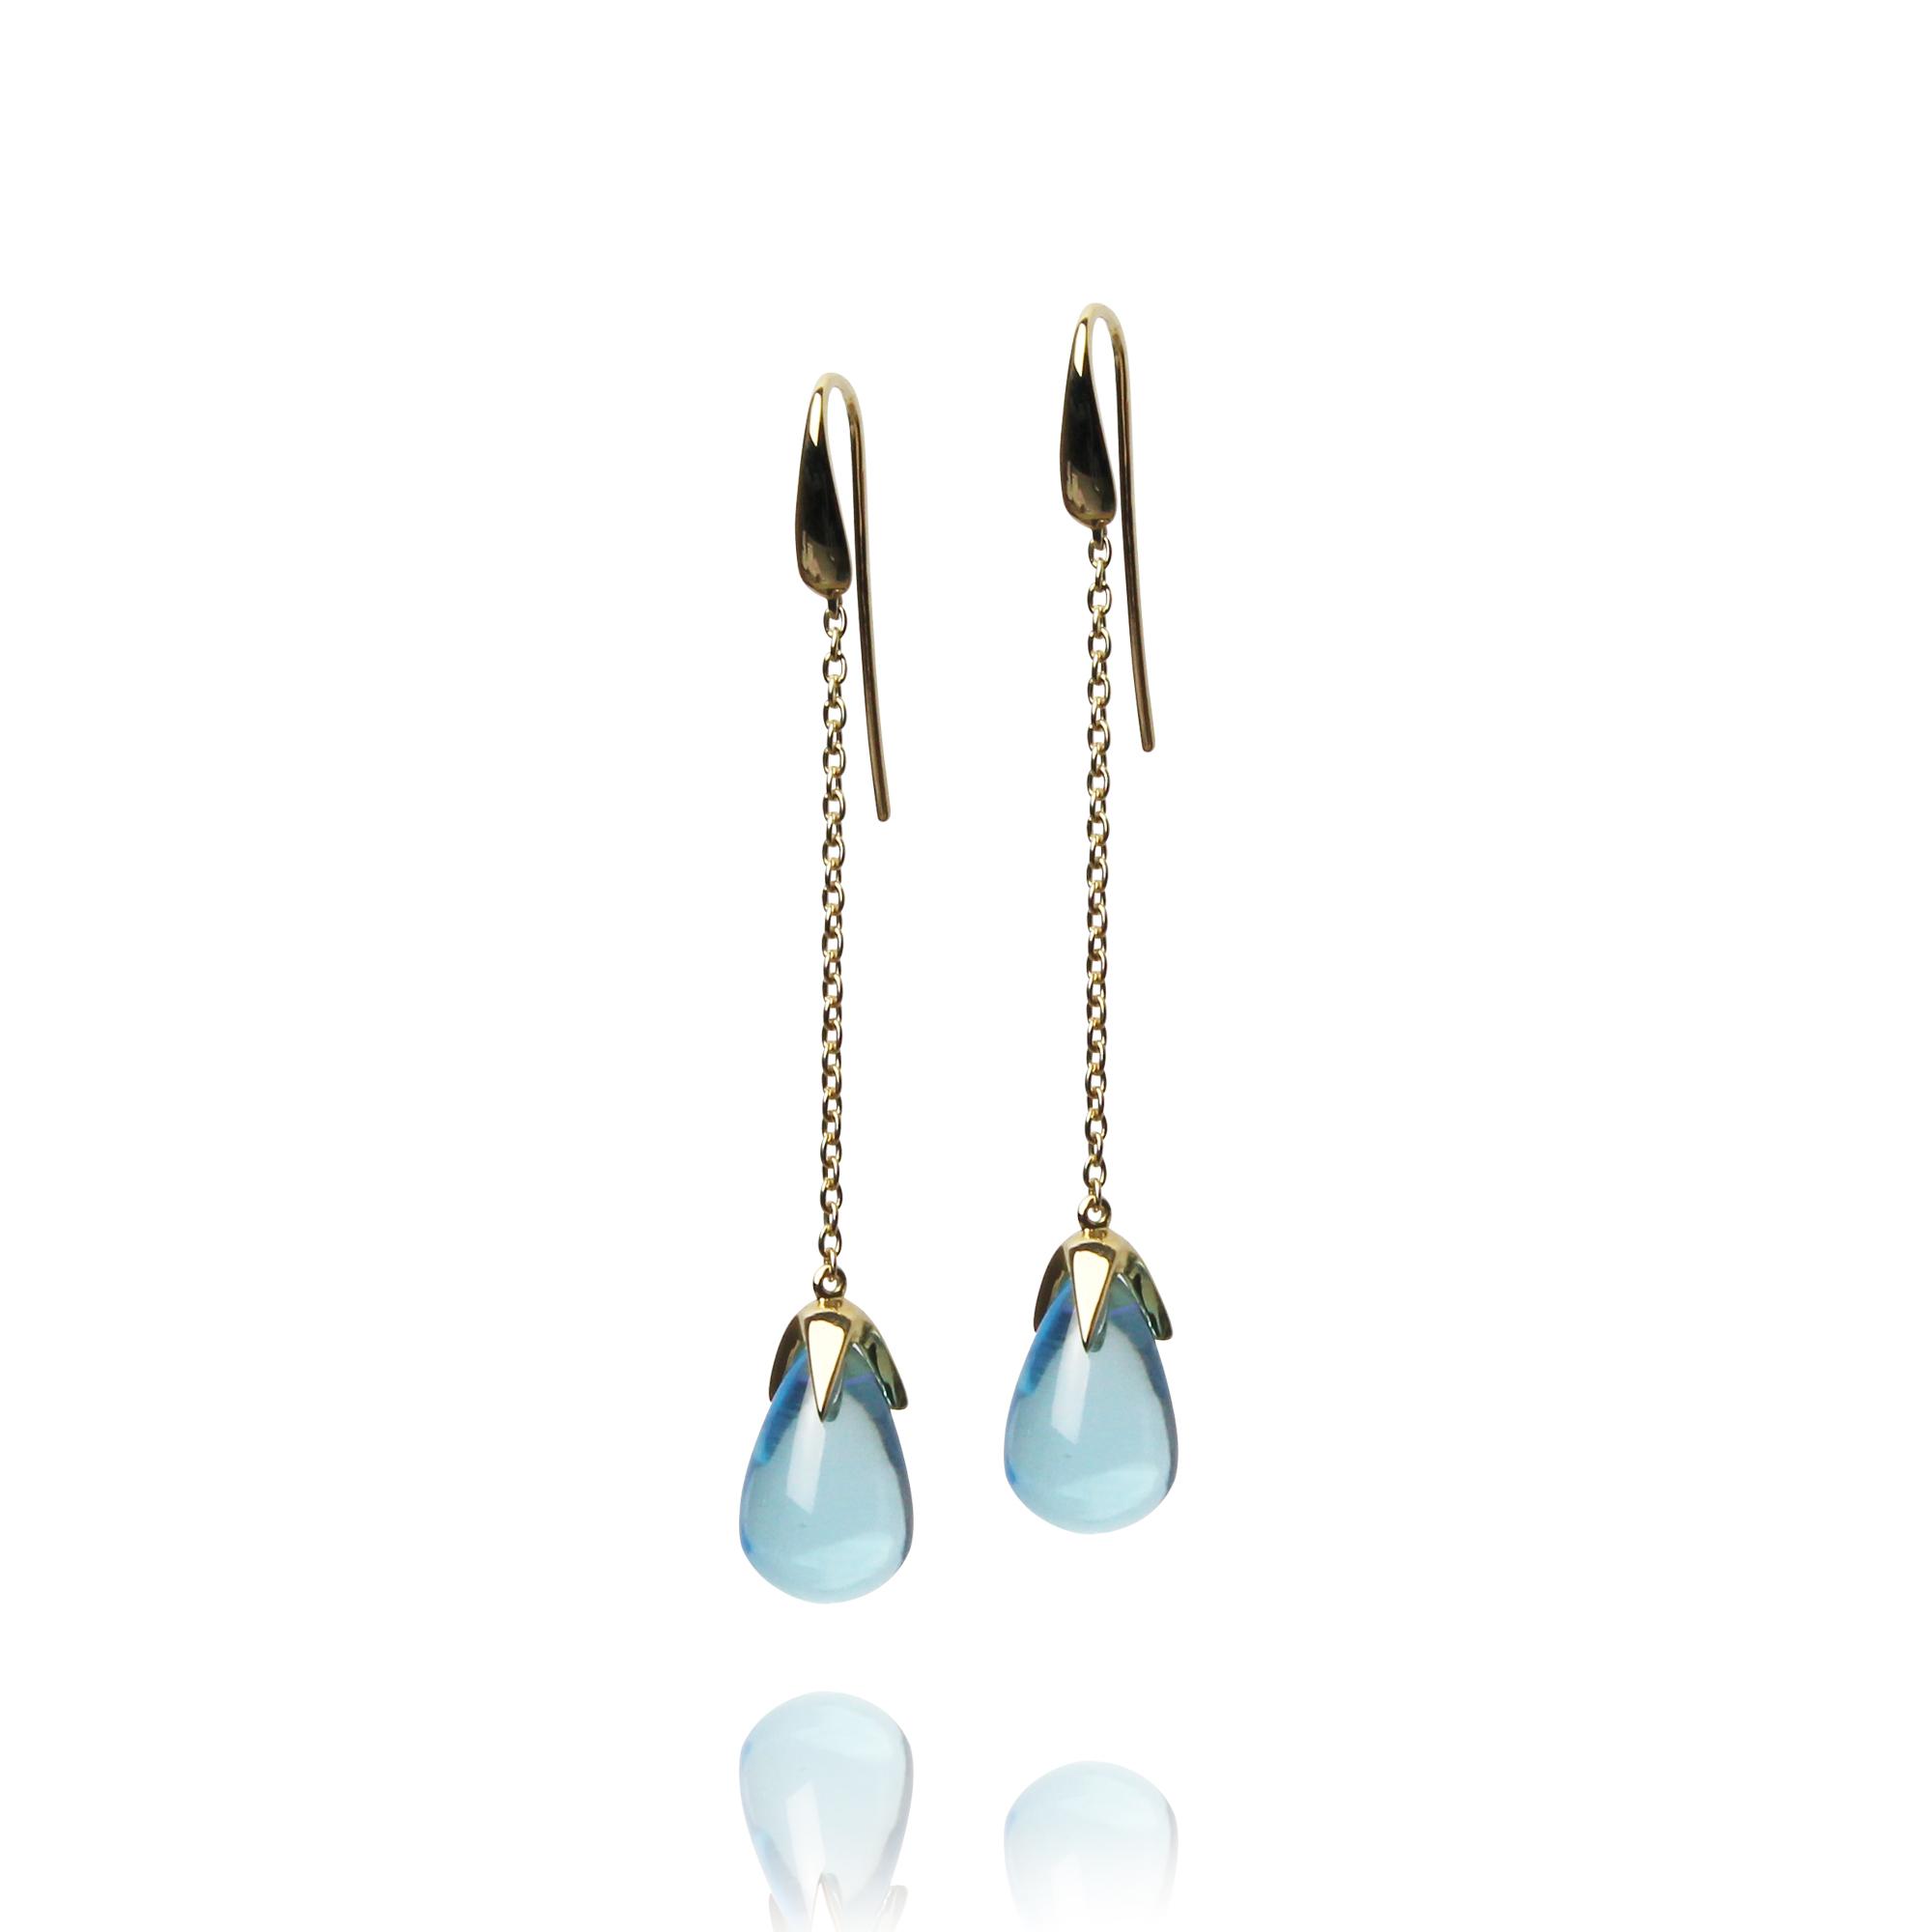 earrings caramelle yellow gold 18 carat blue topaz